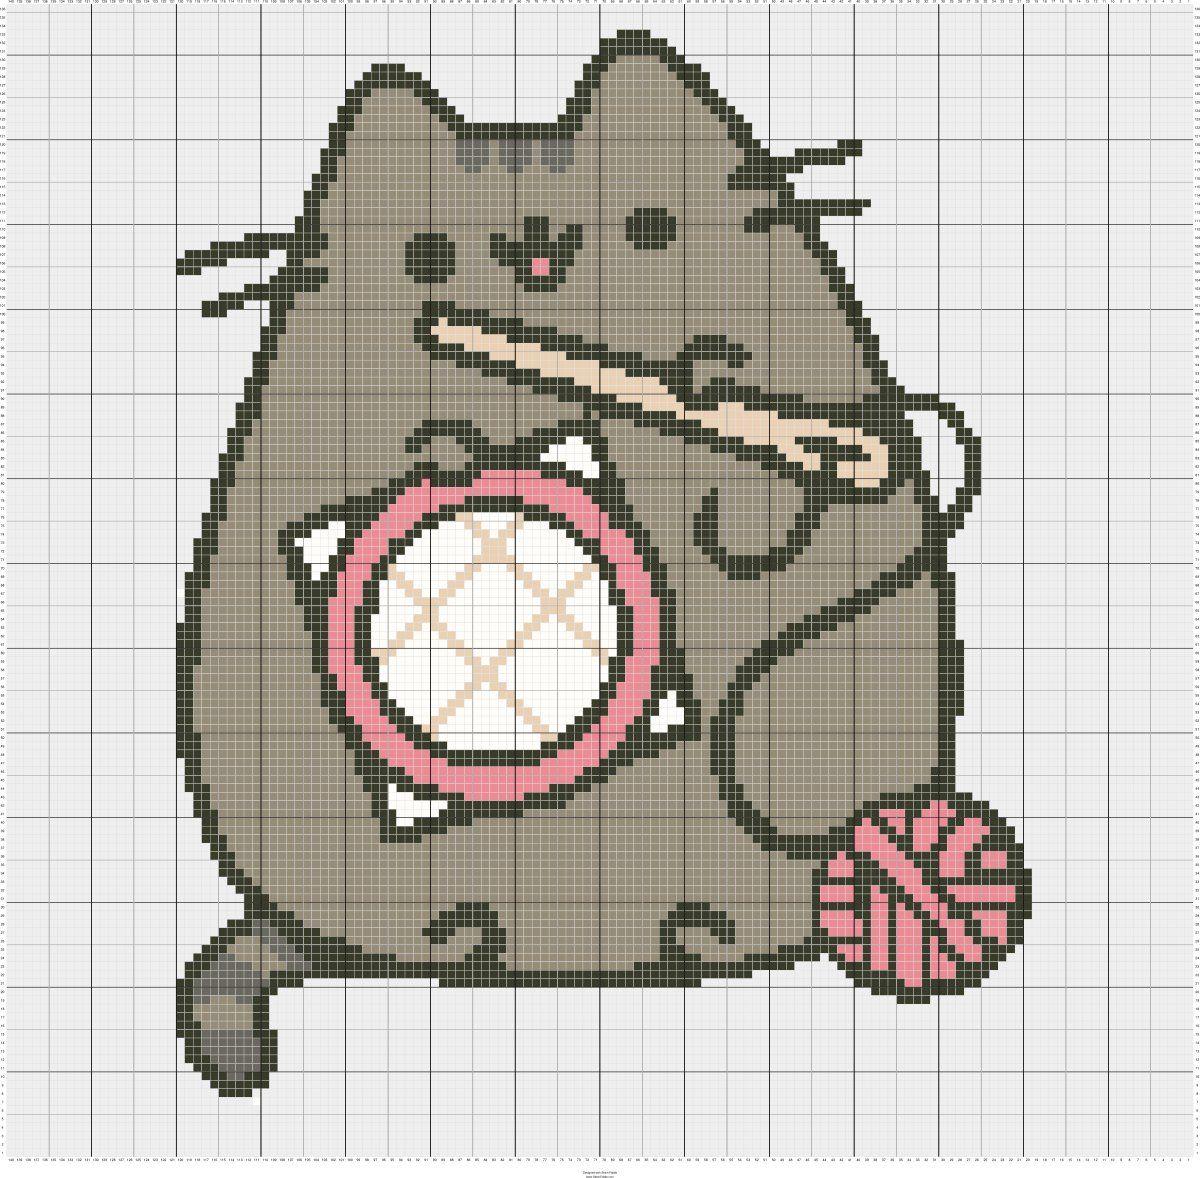 Pattern] Pusheen Cross Stitch Image : CrossStitch | Stitch | Cross